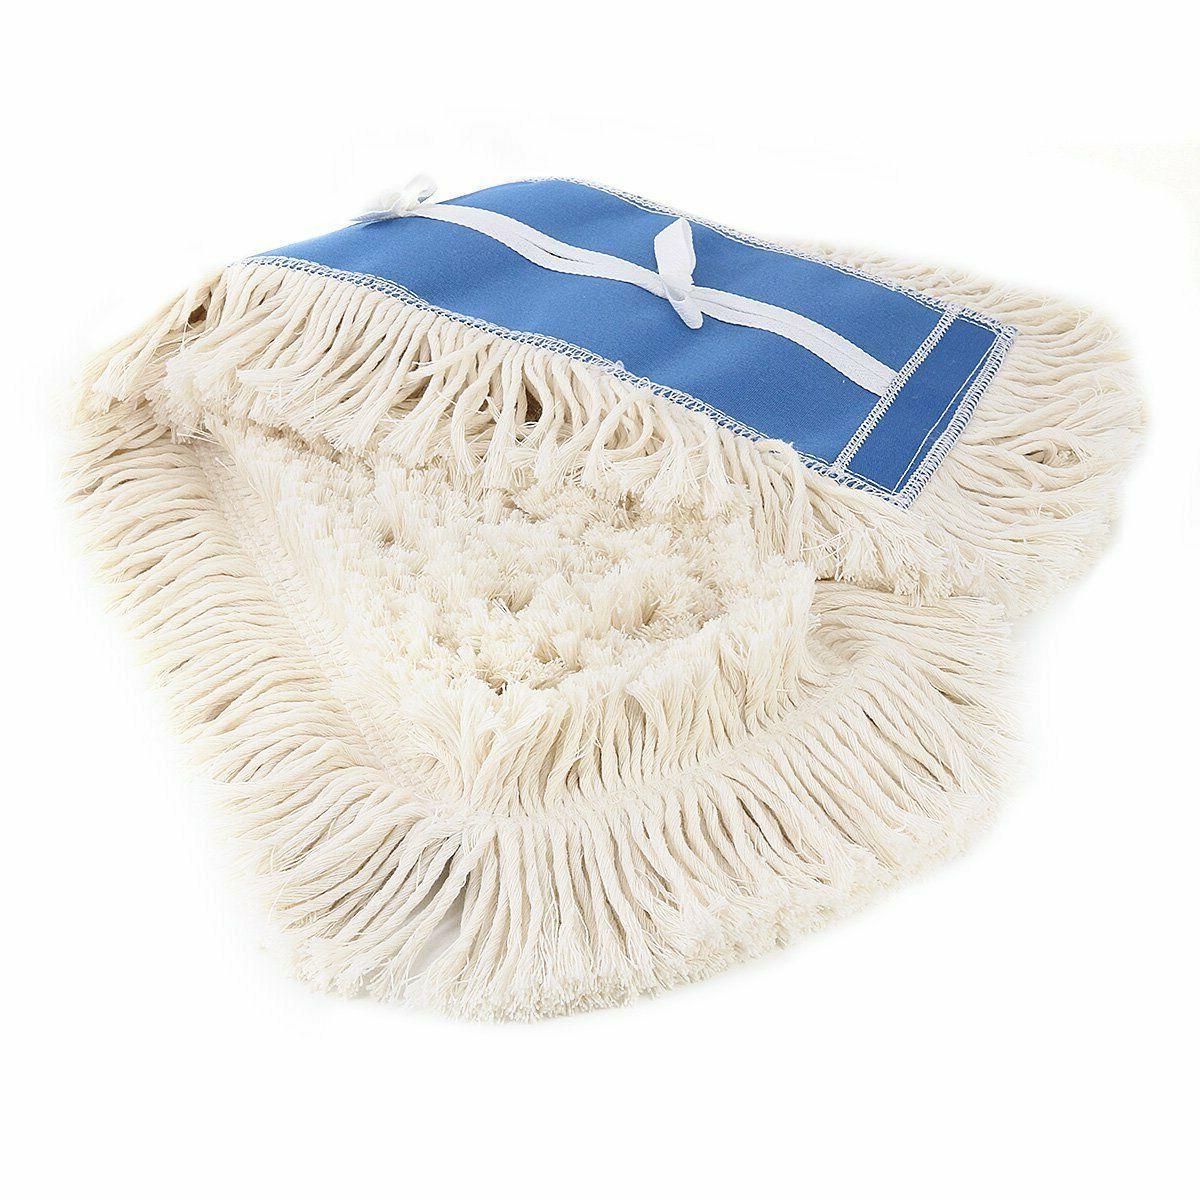 24'' Cotton Dust Mop Head Refill